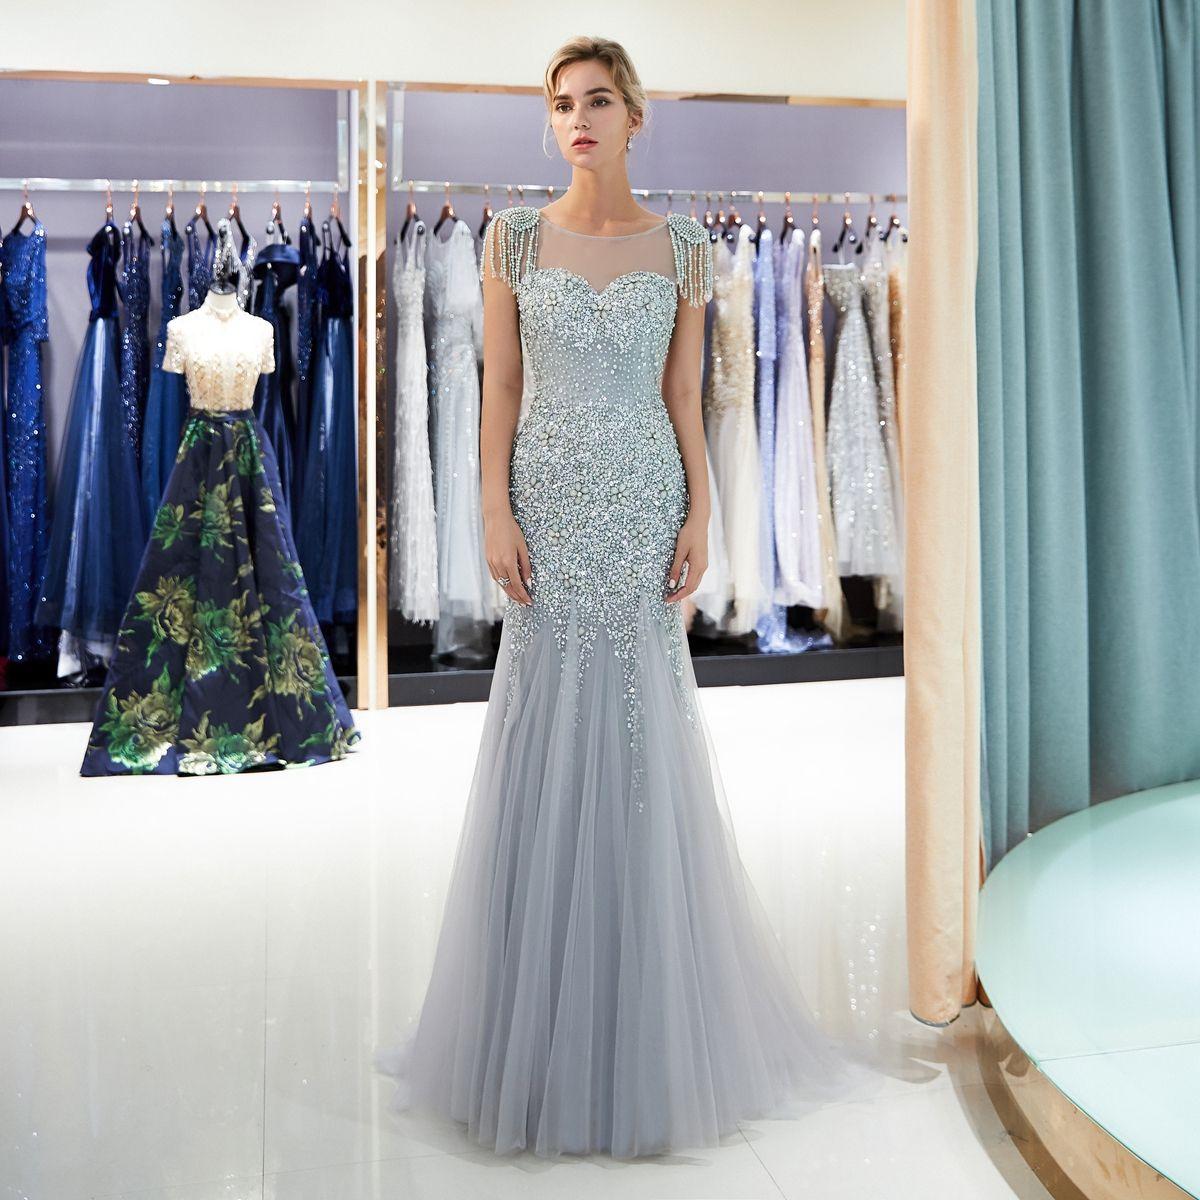 c6de62fd6e7 Luxury Gray Evening Dresses Sparkle Crystal Beaded Prom Gowns Mermaid Party  Ladies Arabic Silver Formal Long Scoop Sheer Neck Gold Elegant Elegant  Evening ...